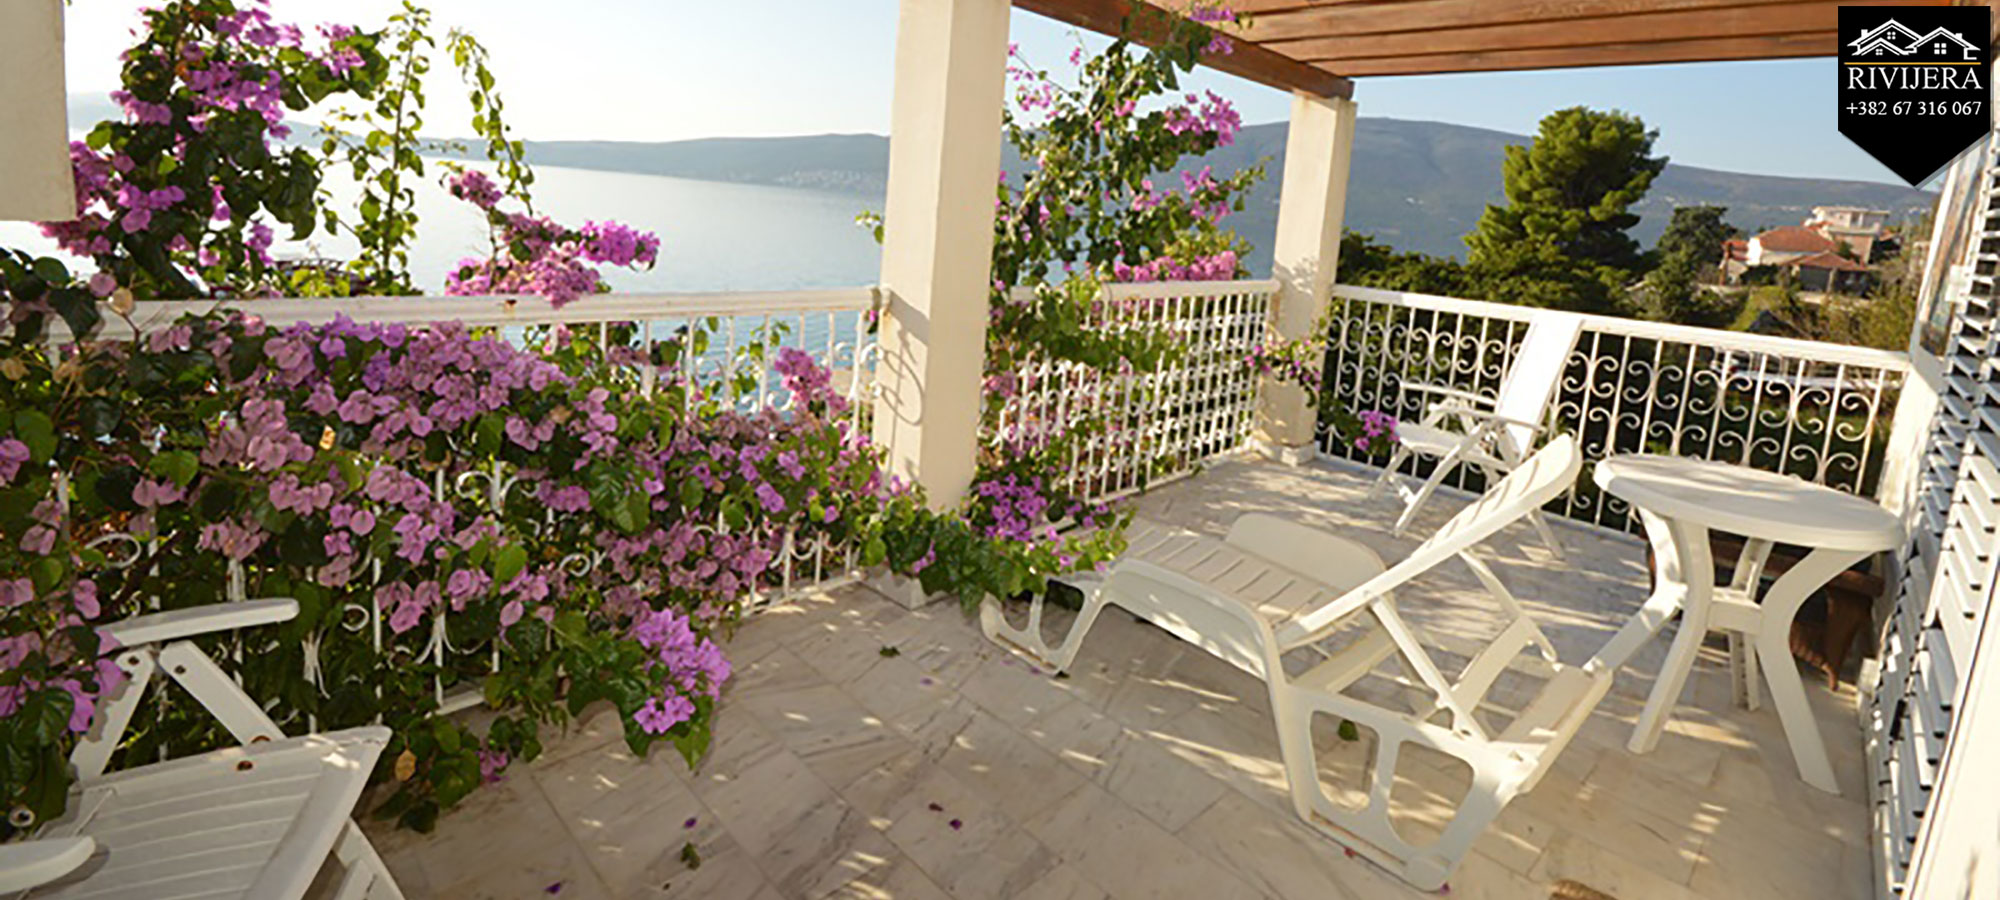 Luksuzna Vila na obali mora Bijela